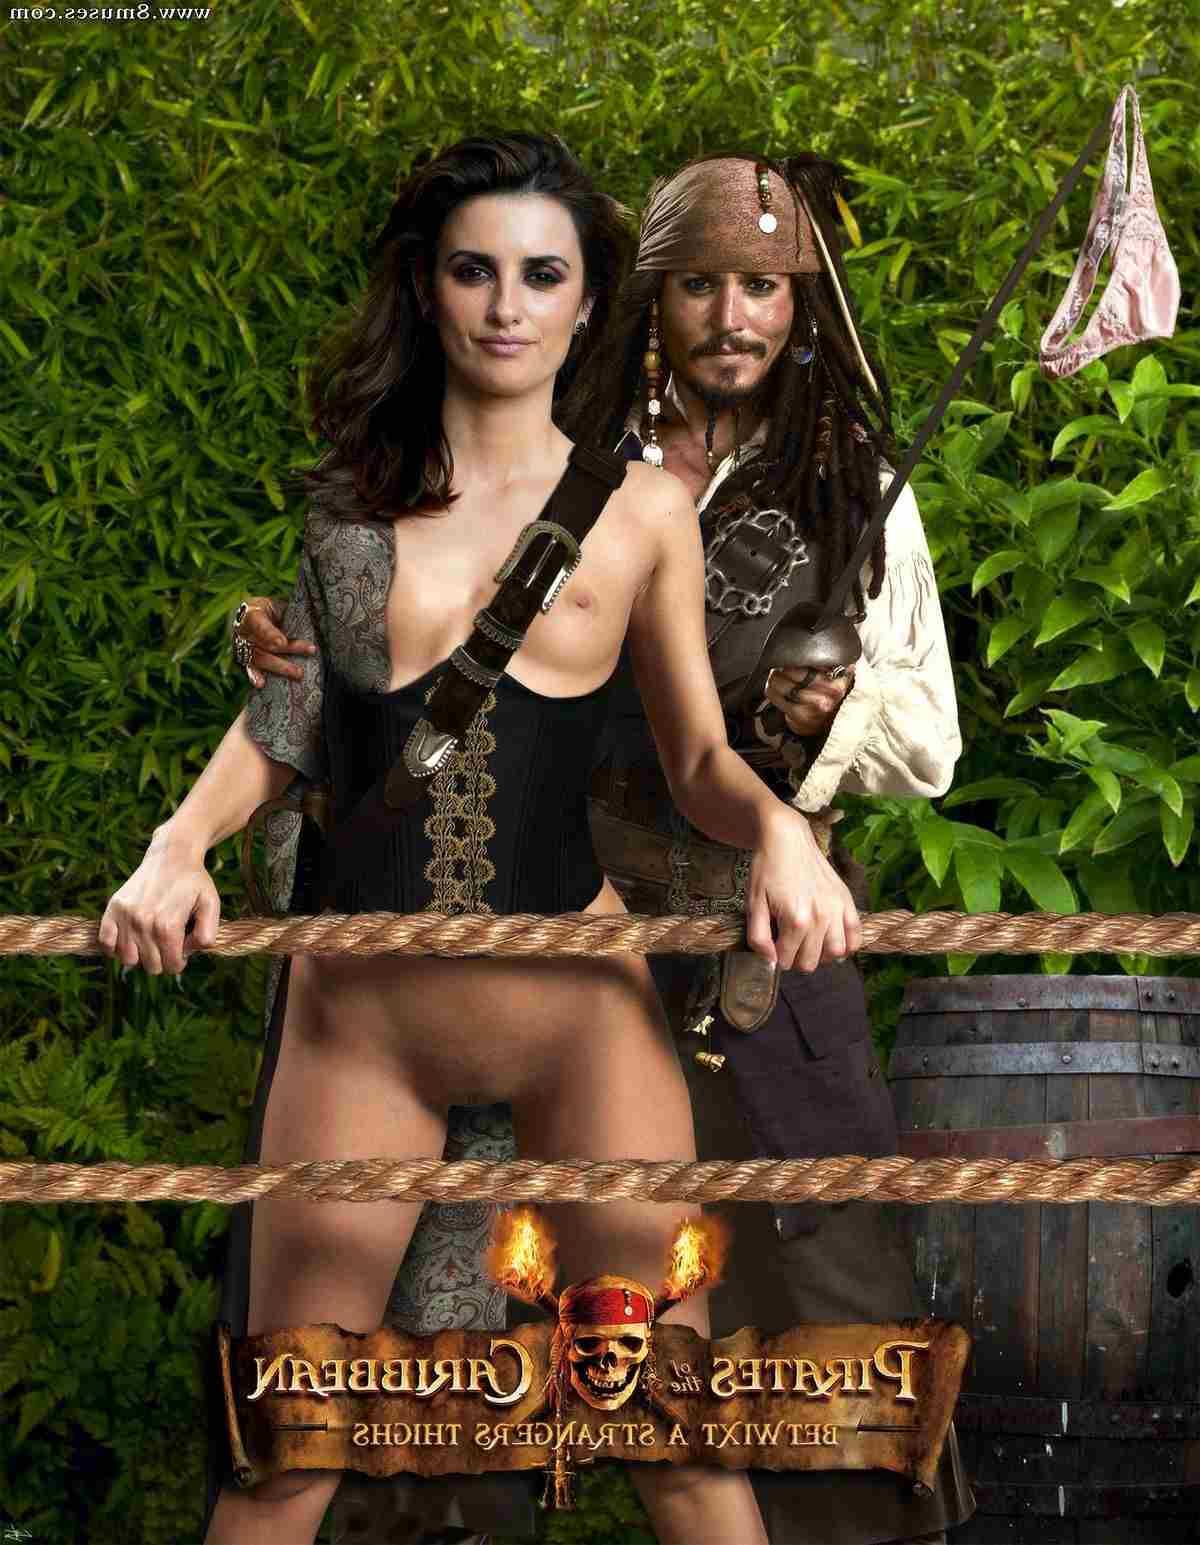 Fake-Celebrities-Sex-Pictures/Penelope-Cruz Penelope_Cruz__8muses_-_Sex_and_Porn_Comics_50.jpg